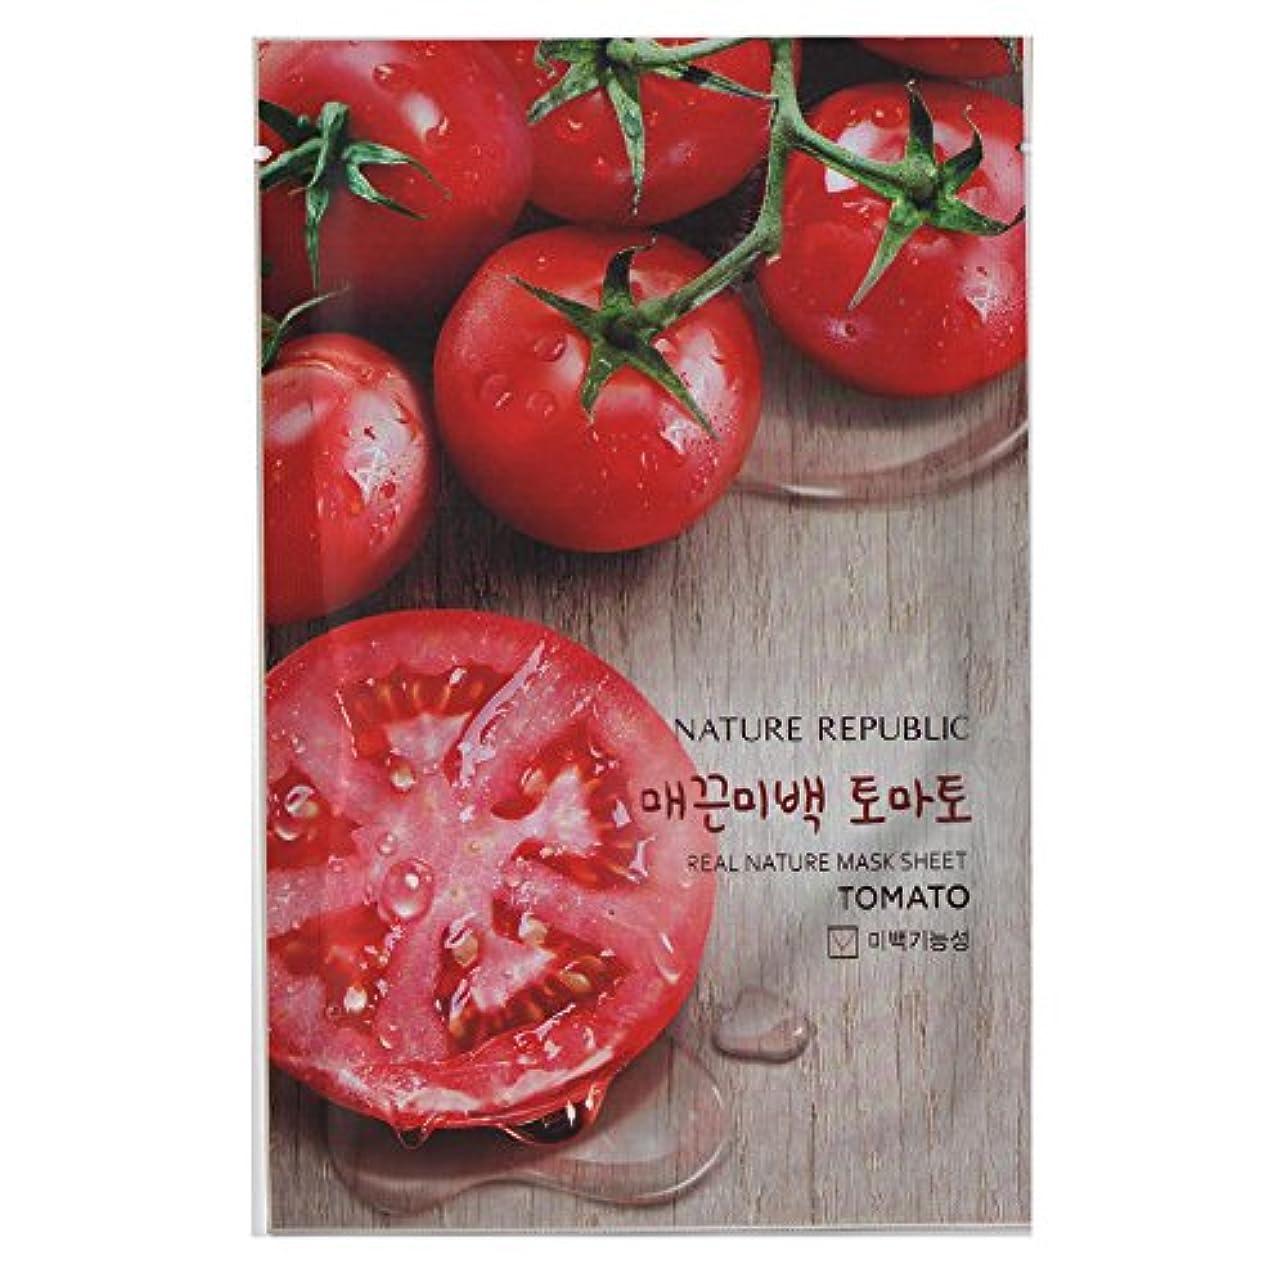 [NATURE REPUBLIC] リアルネイチャー マスクシート Real Nature Mask Sheet (Tomato (トマト) 10個) [並行輸入品]